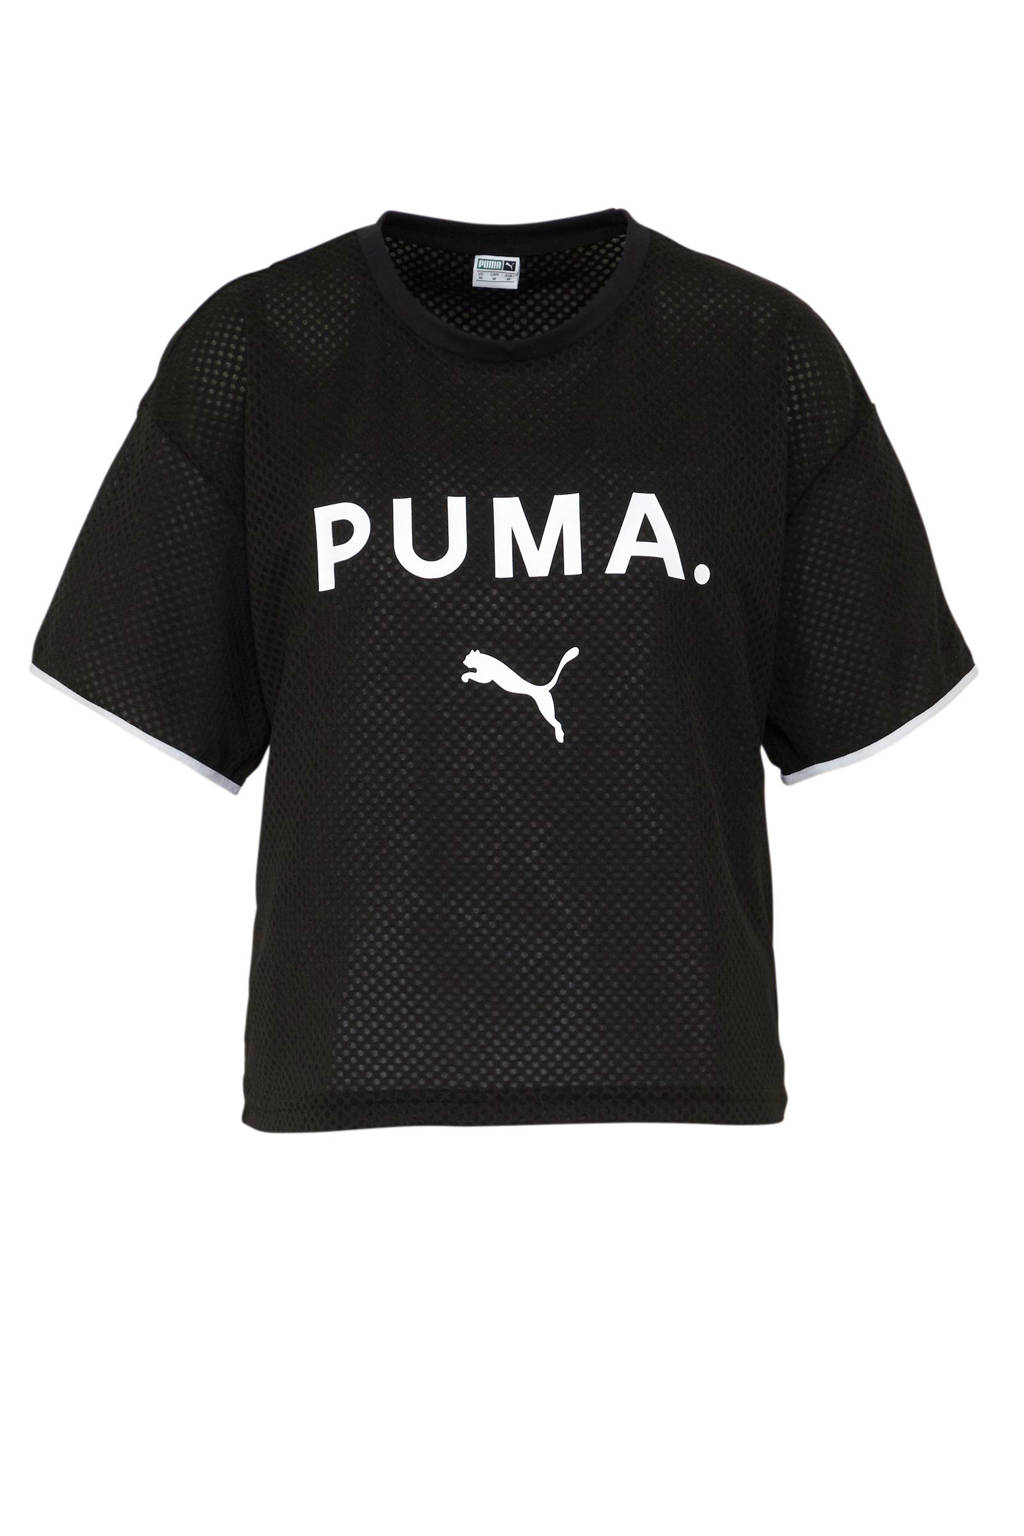 Puma T-shirt met printopdruk zwart/wit, Zwart/wit